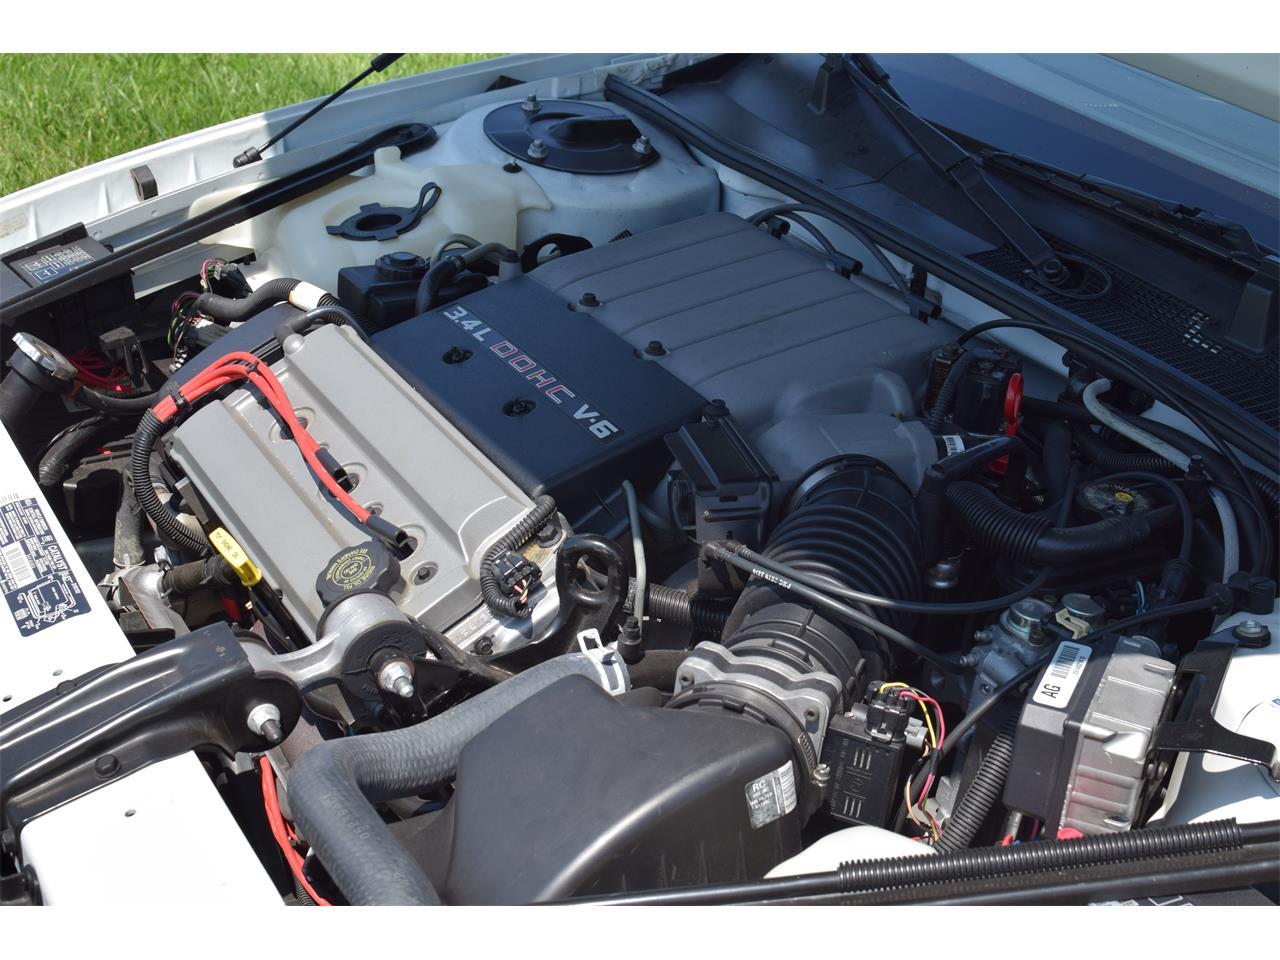 1995 Chevrolet Monte Carlo (CC-1240741) for sale in Watertown, Minnesota